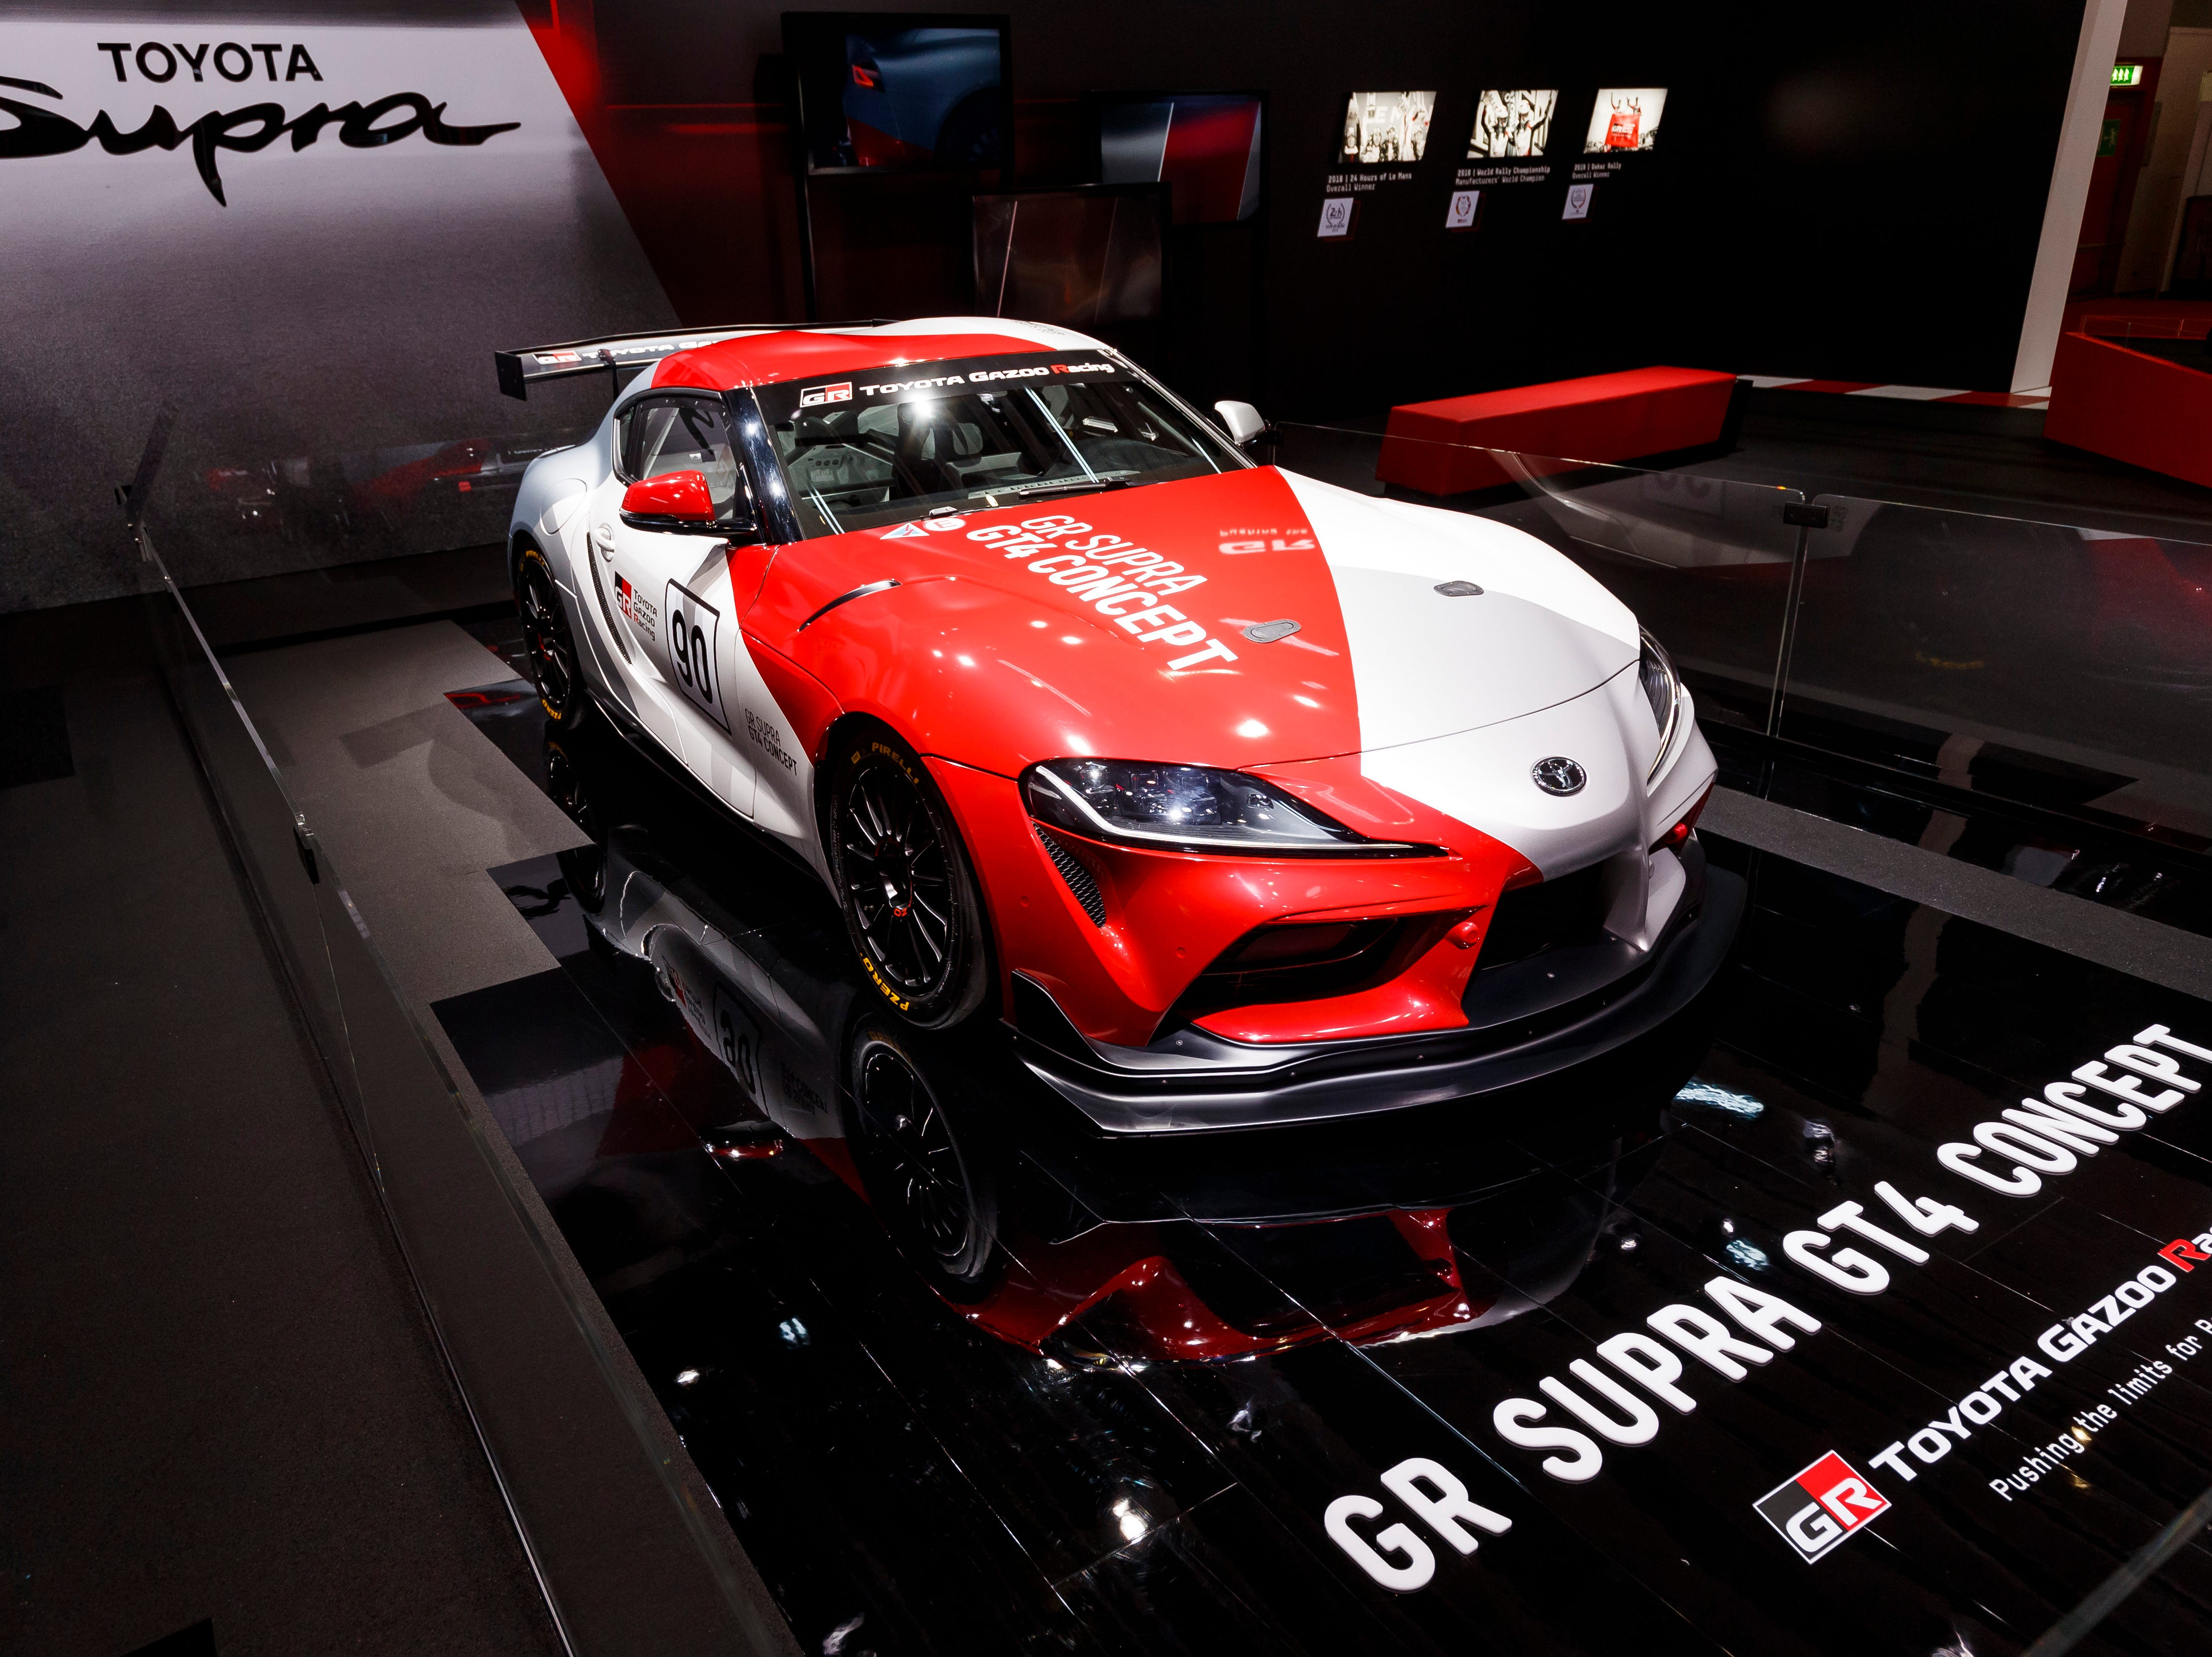 The Toyota GR Supra GT4 Concept